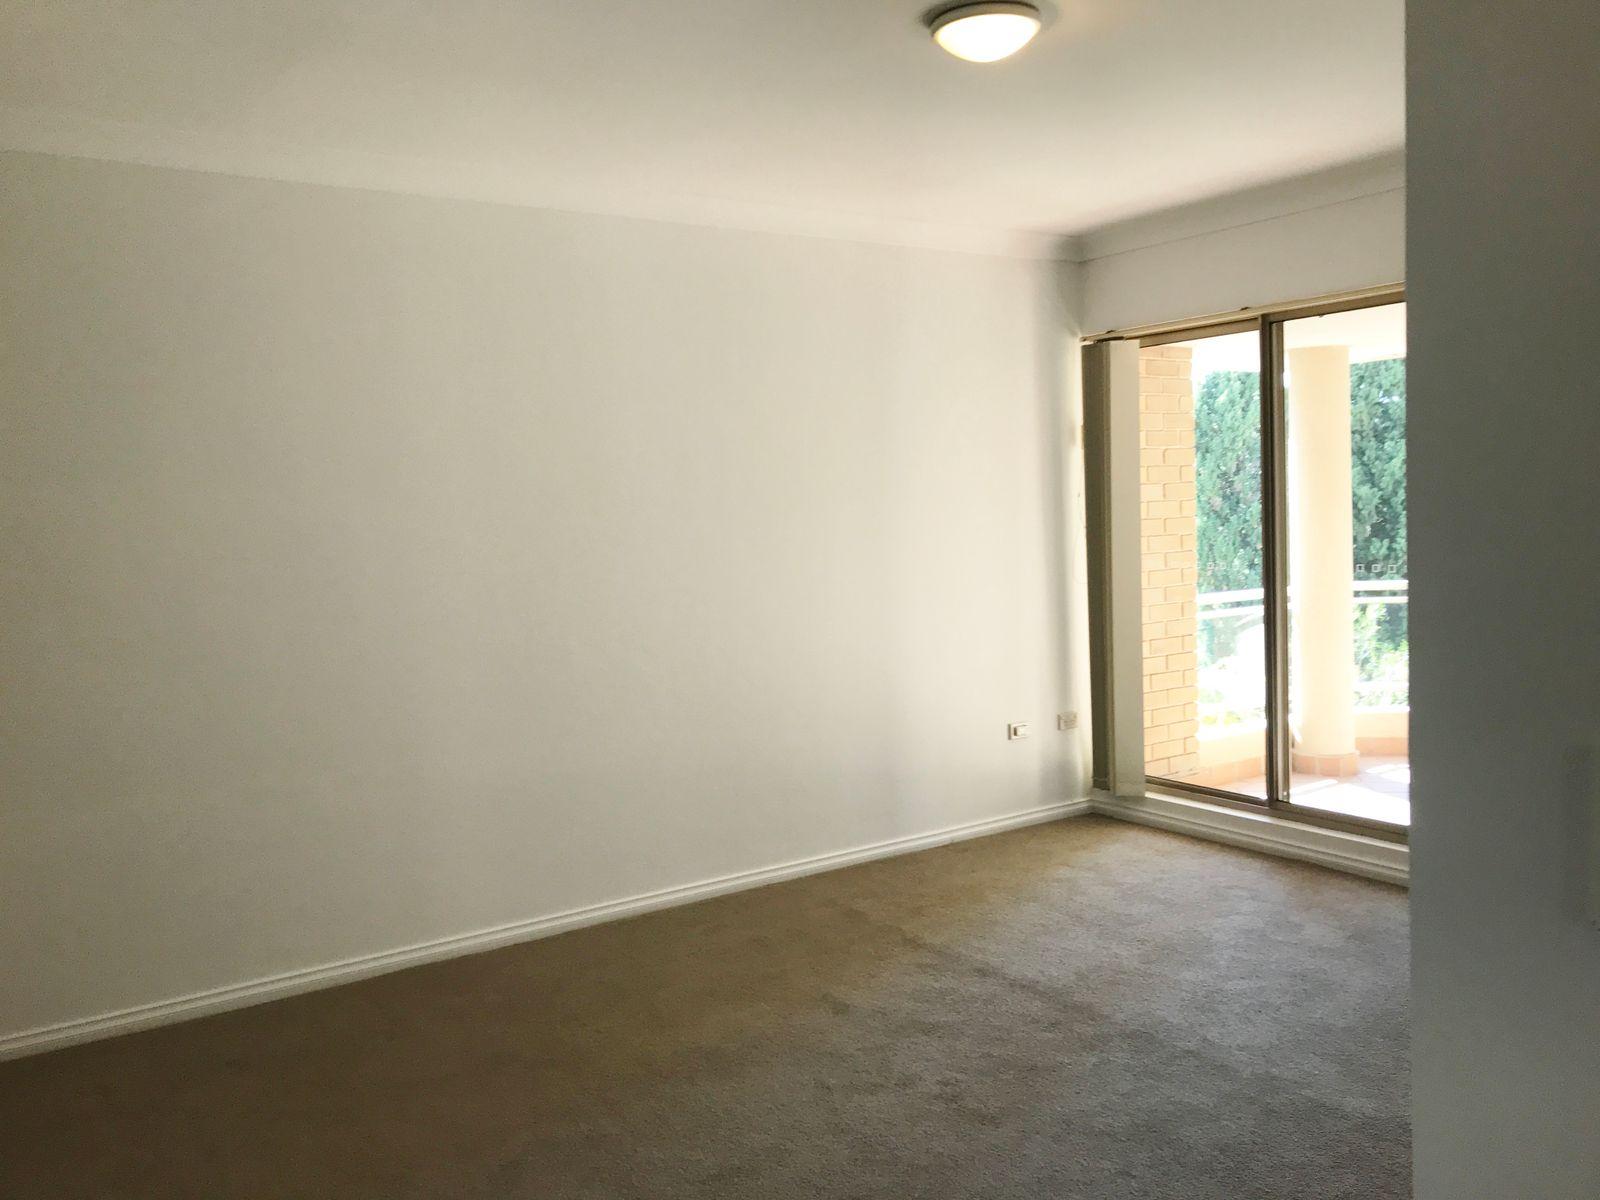 11/11-13 Sutherland Road, Chatswood, NSW 2067